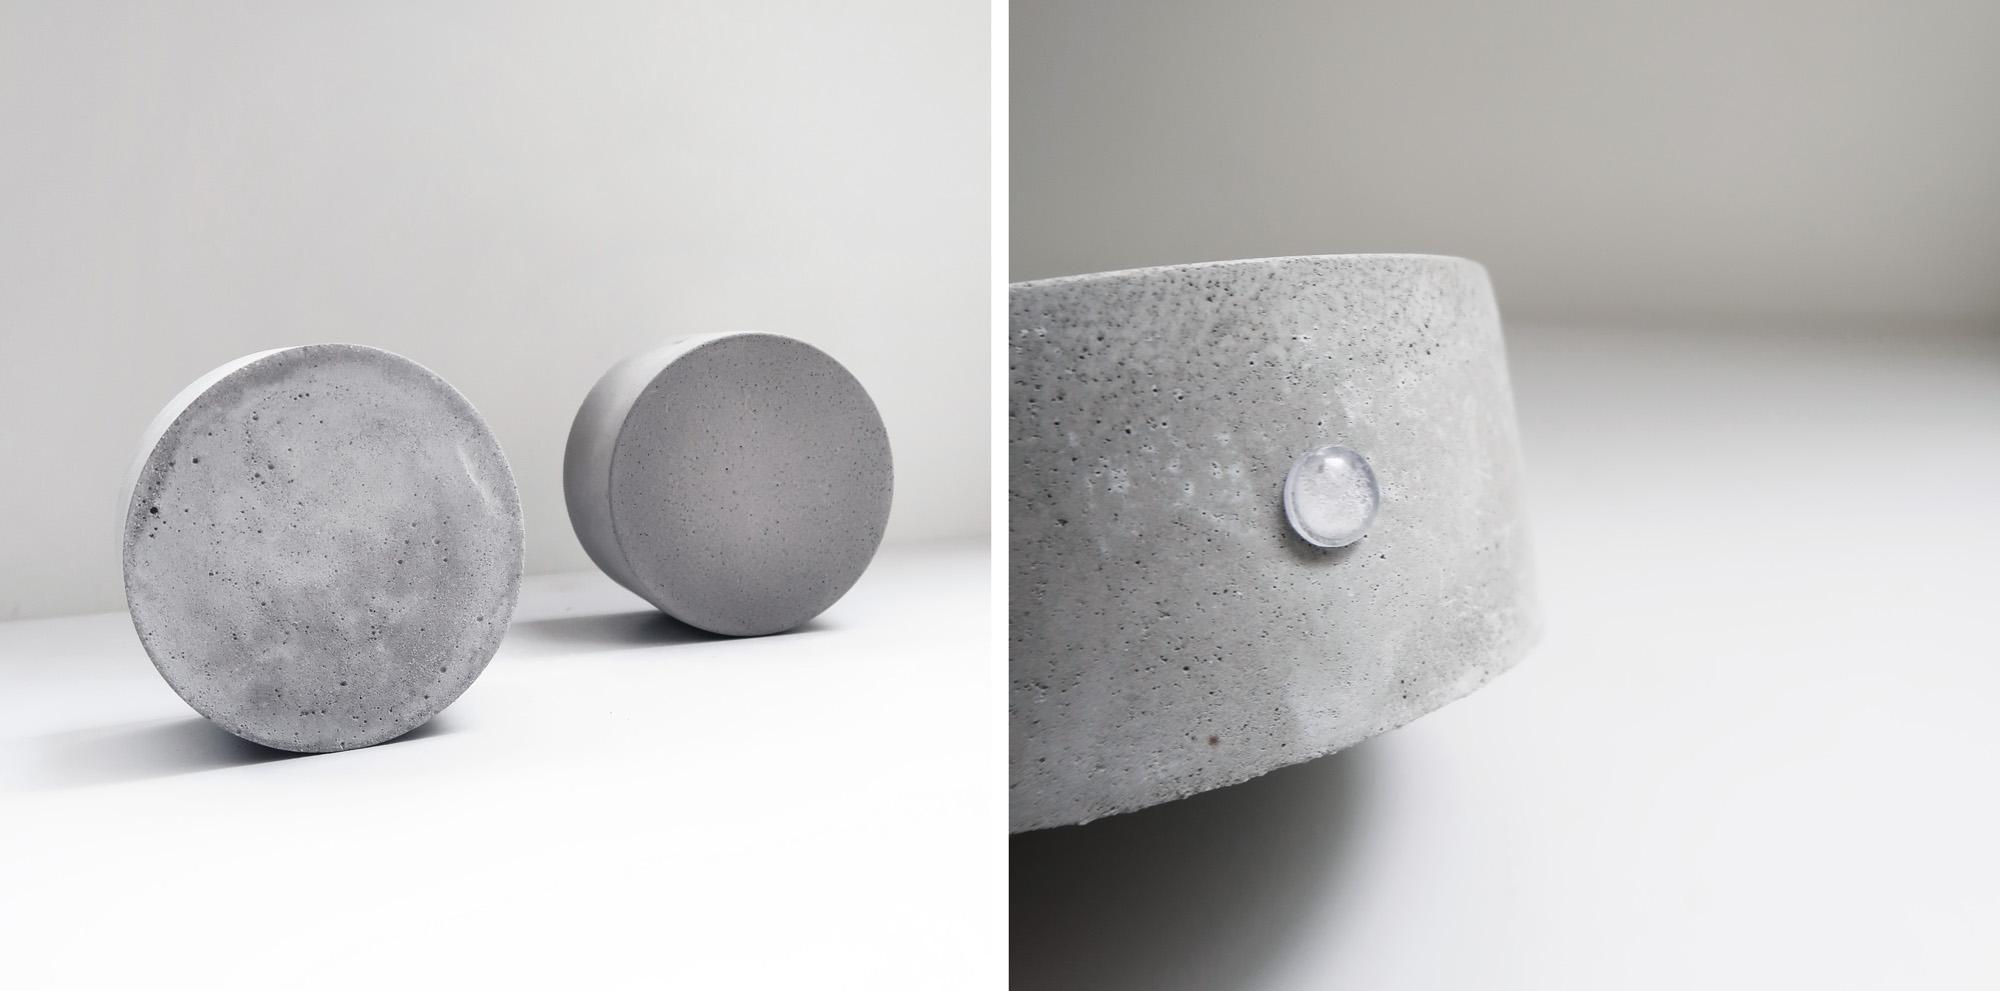 FULL MOON 望月水泥設計家飾・居家擺飾・植物花瓶